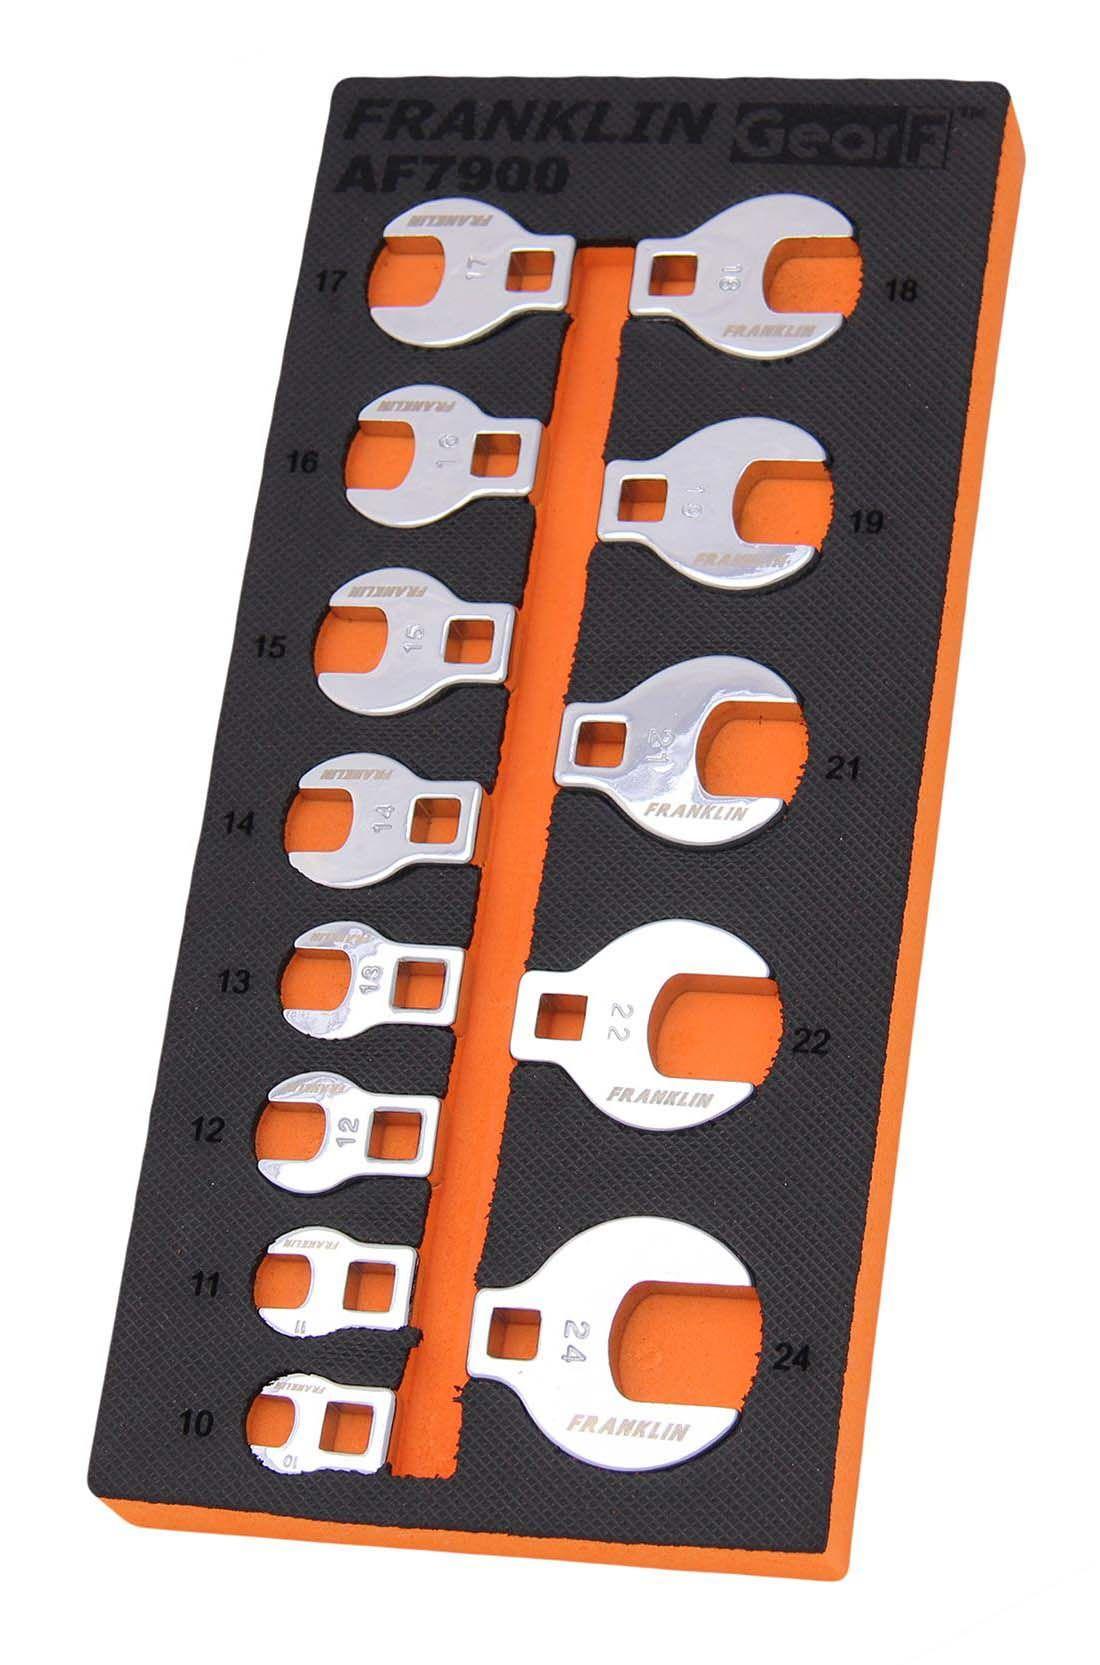 "Franklin GearF 13 Piece Crowfoot Wrench Set 3/8"" Drive"